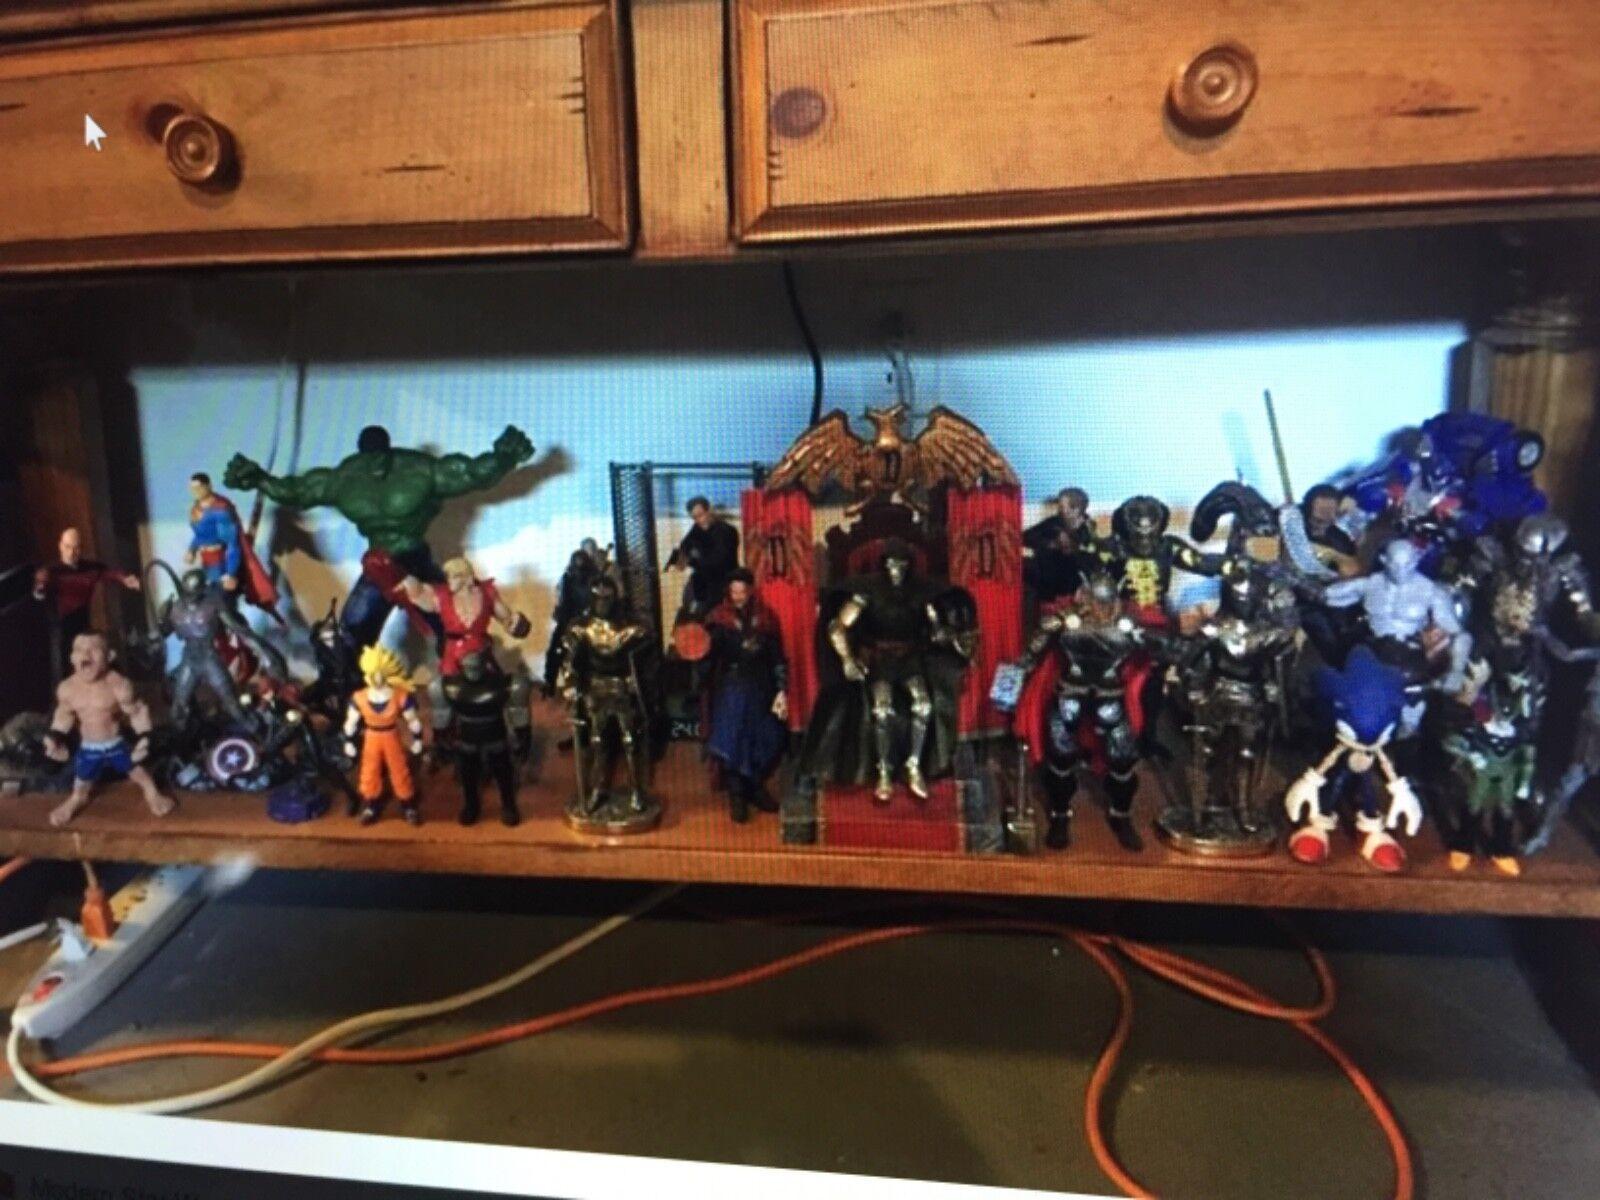 Huge Action Figure & Statue Collectibles Lot Marvel DC Joker Game of Thrones